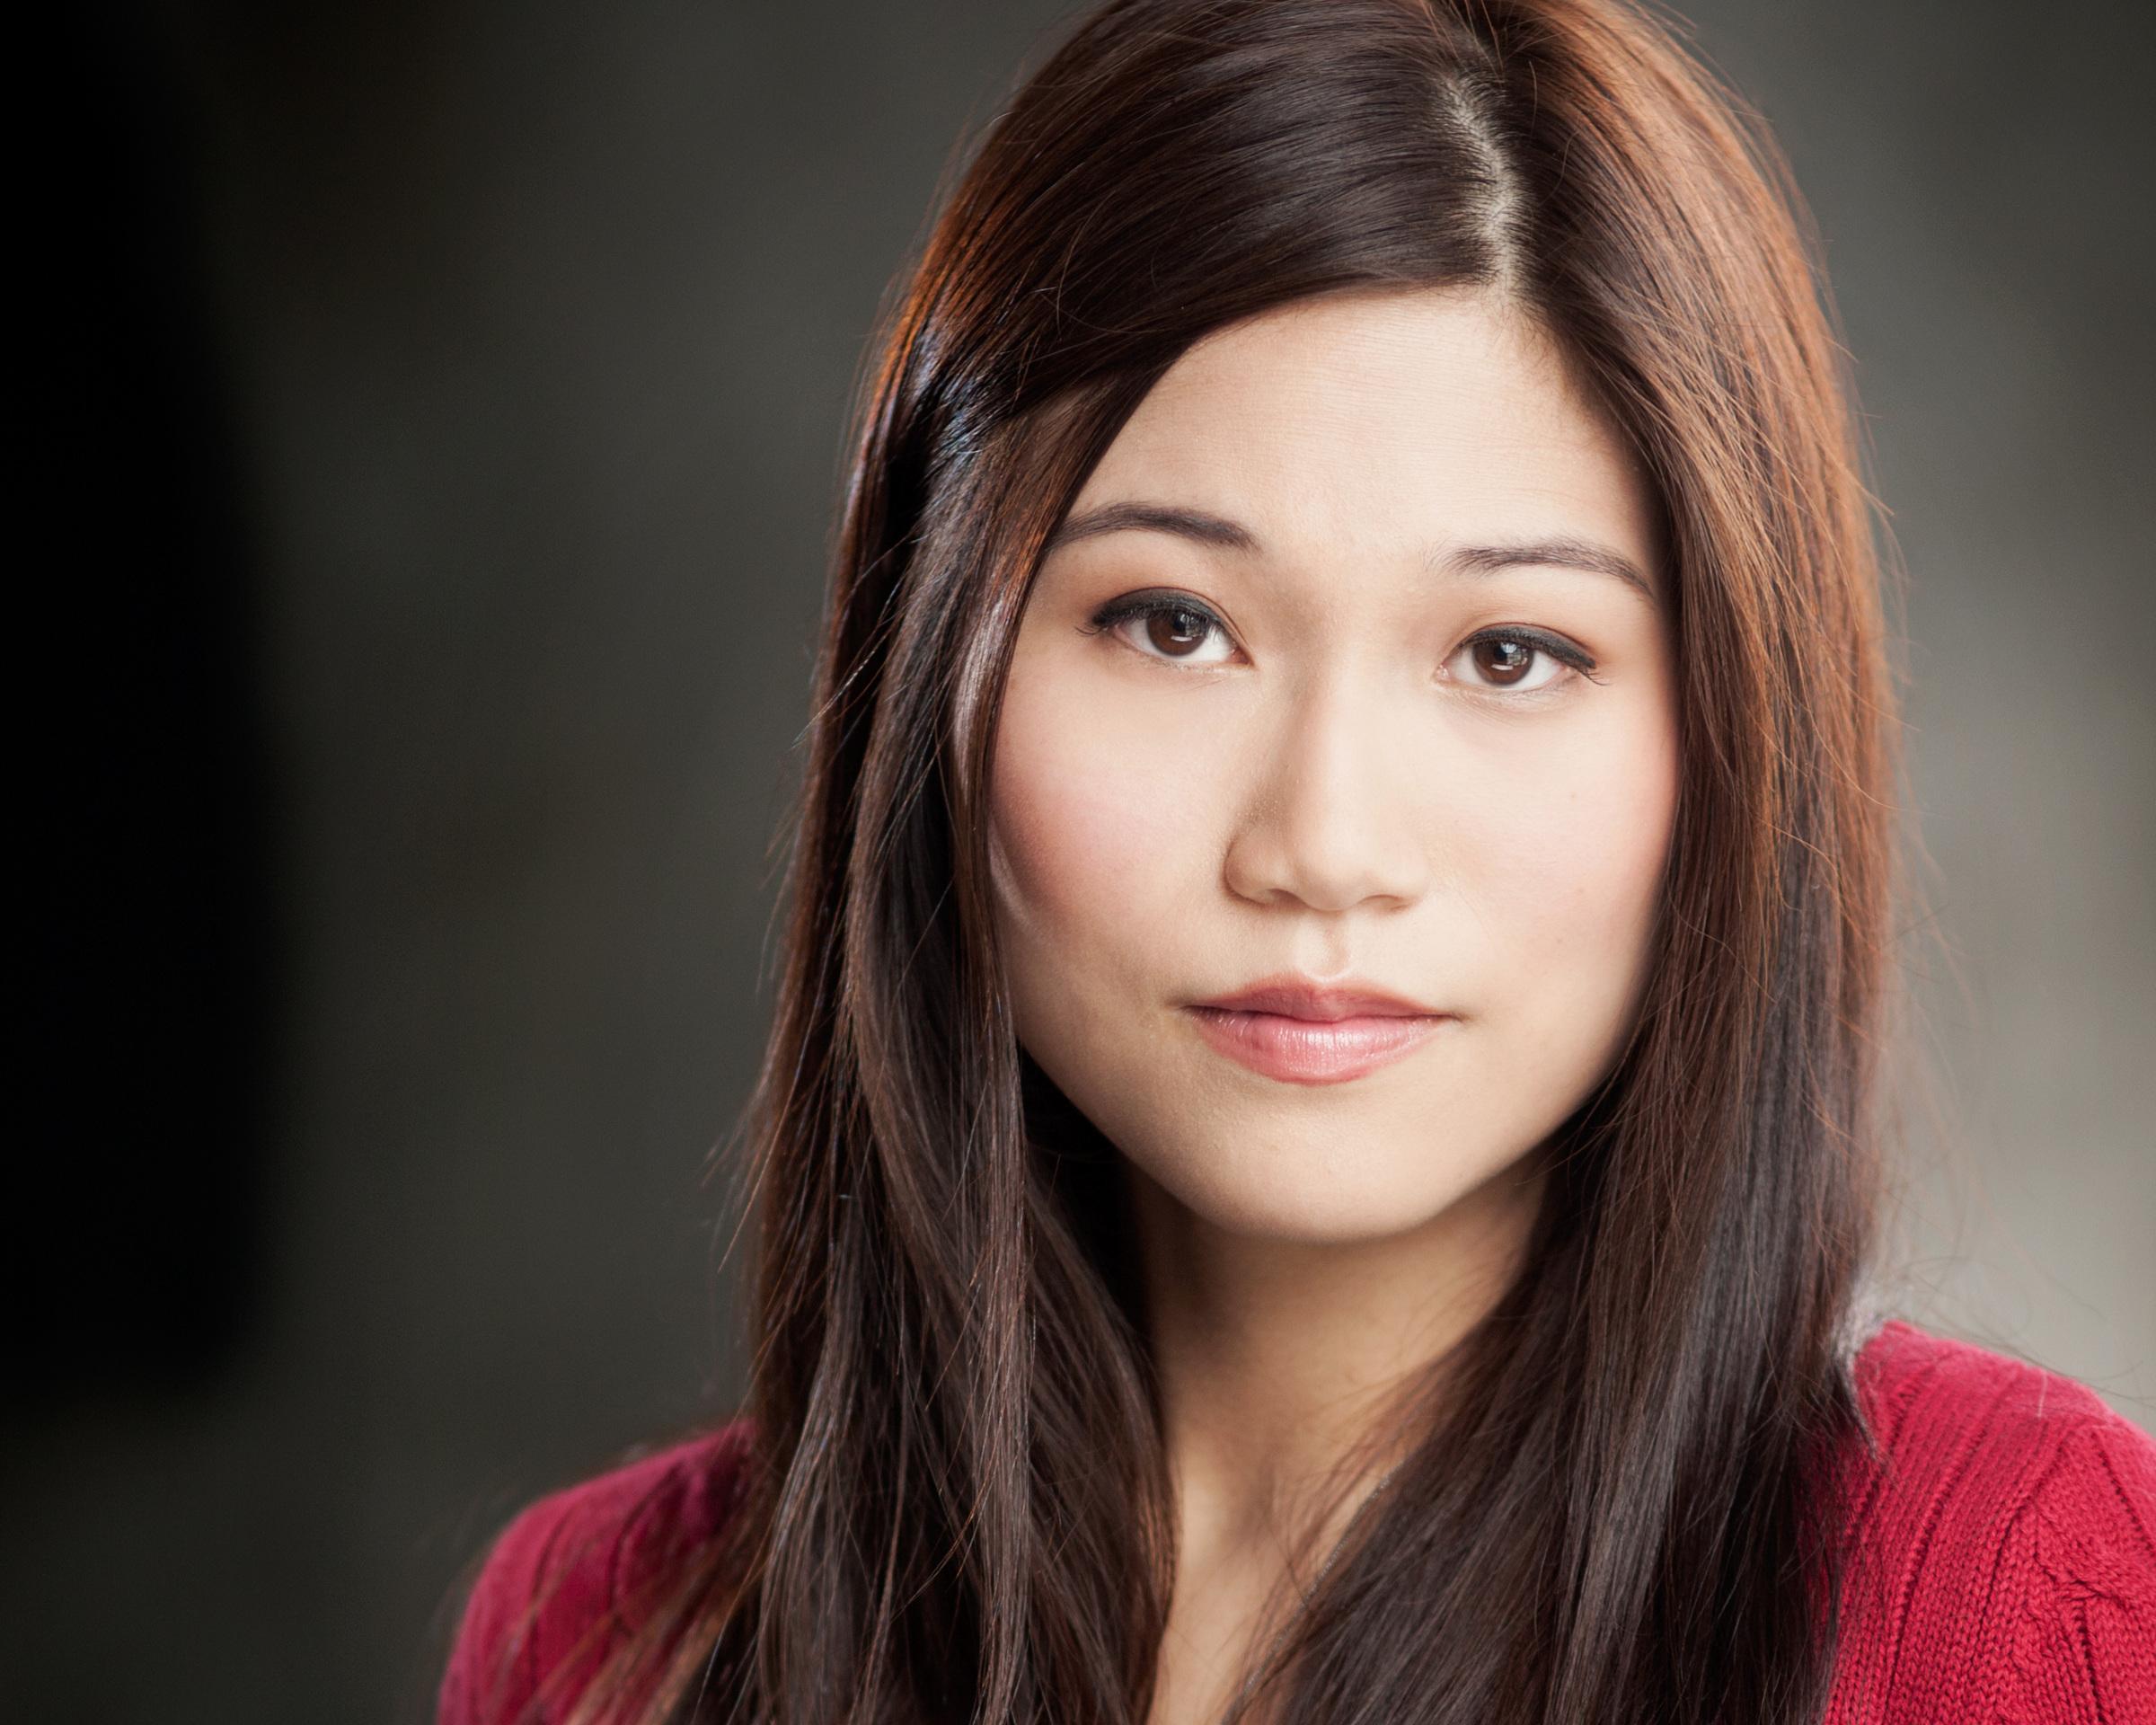 Lindsay+Wong+credit+Shimon+red+sweater.jpg